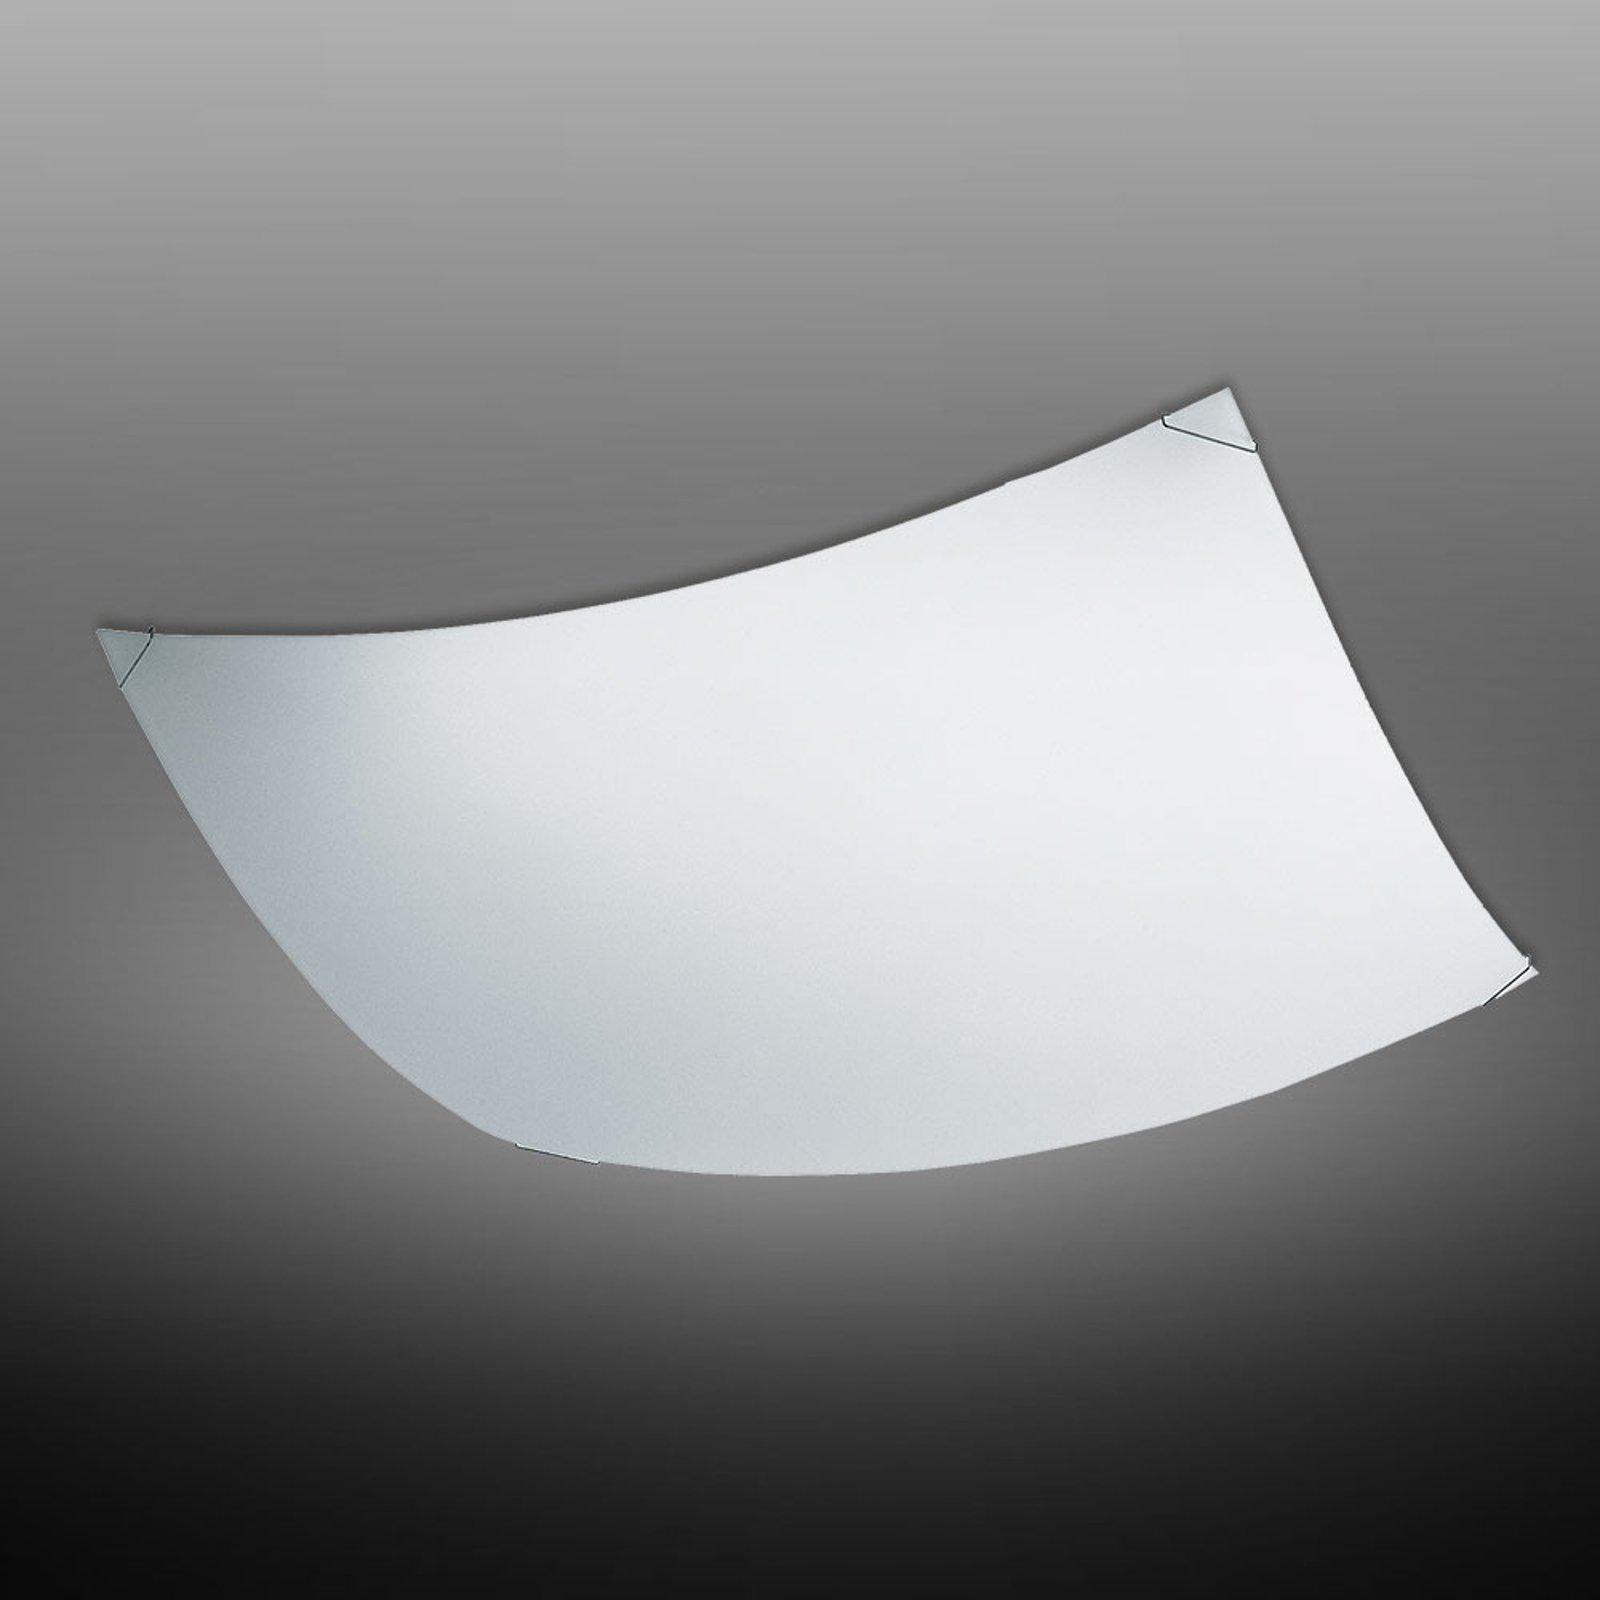 Qadra Ice taklampe, 42 cm